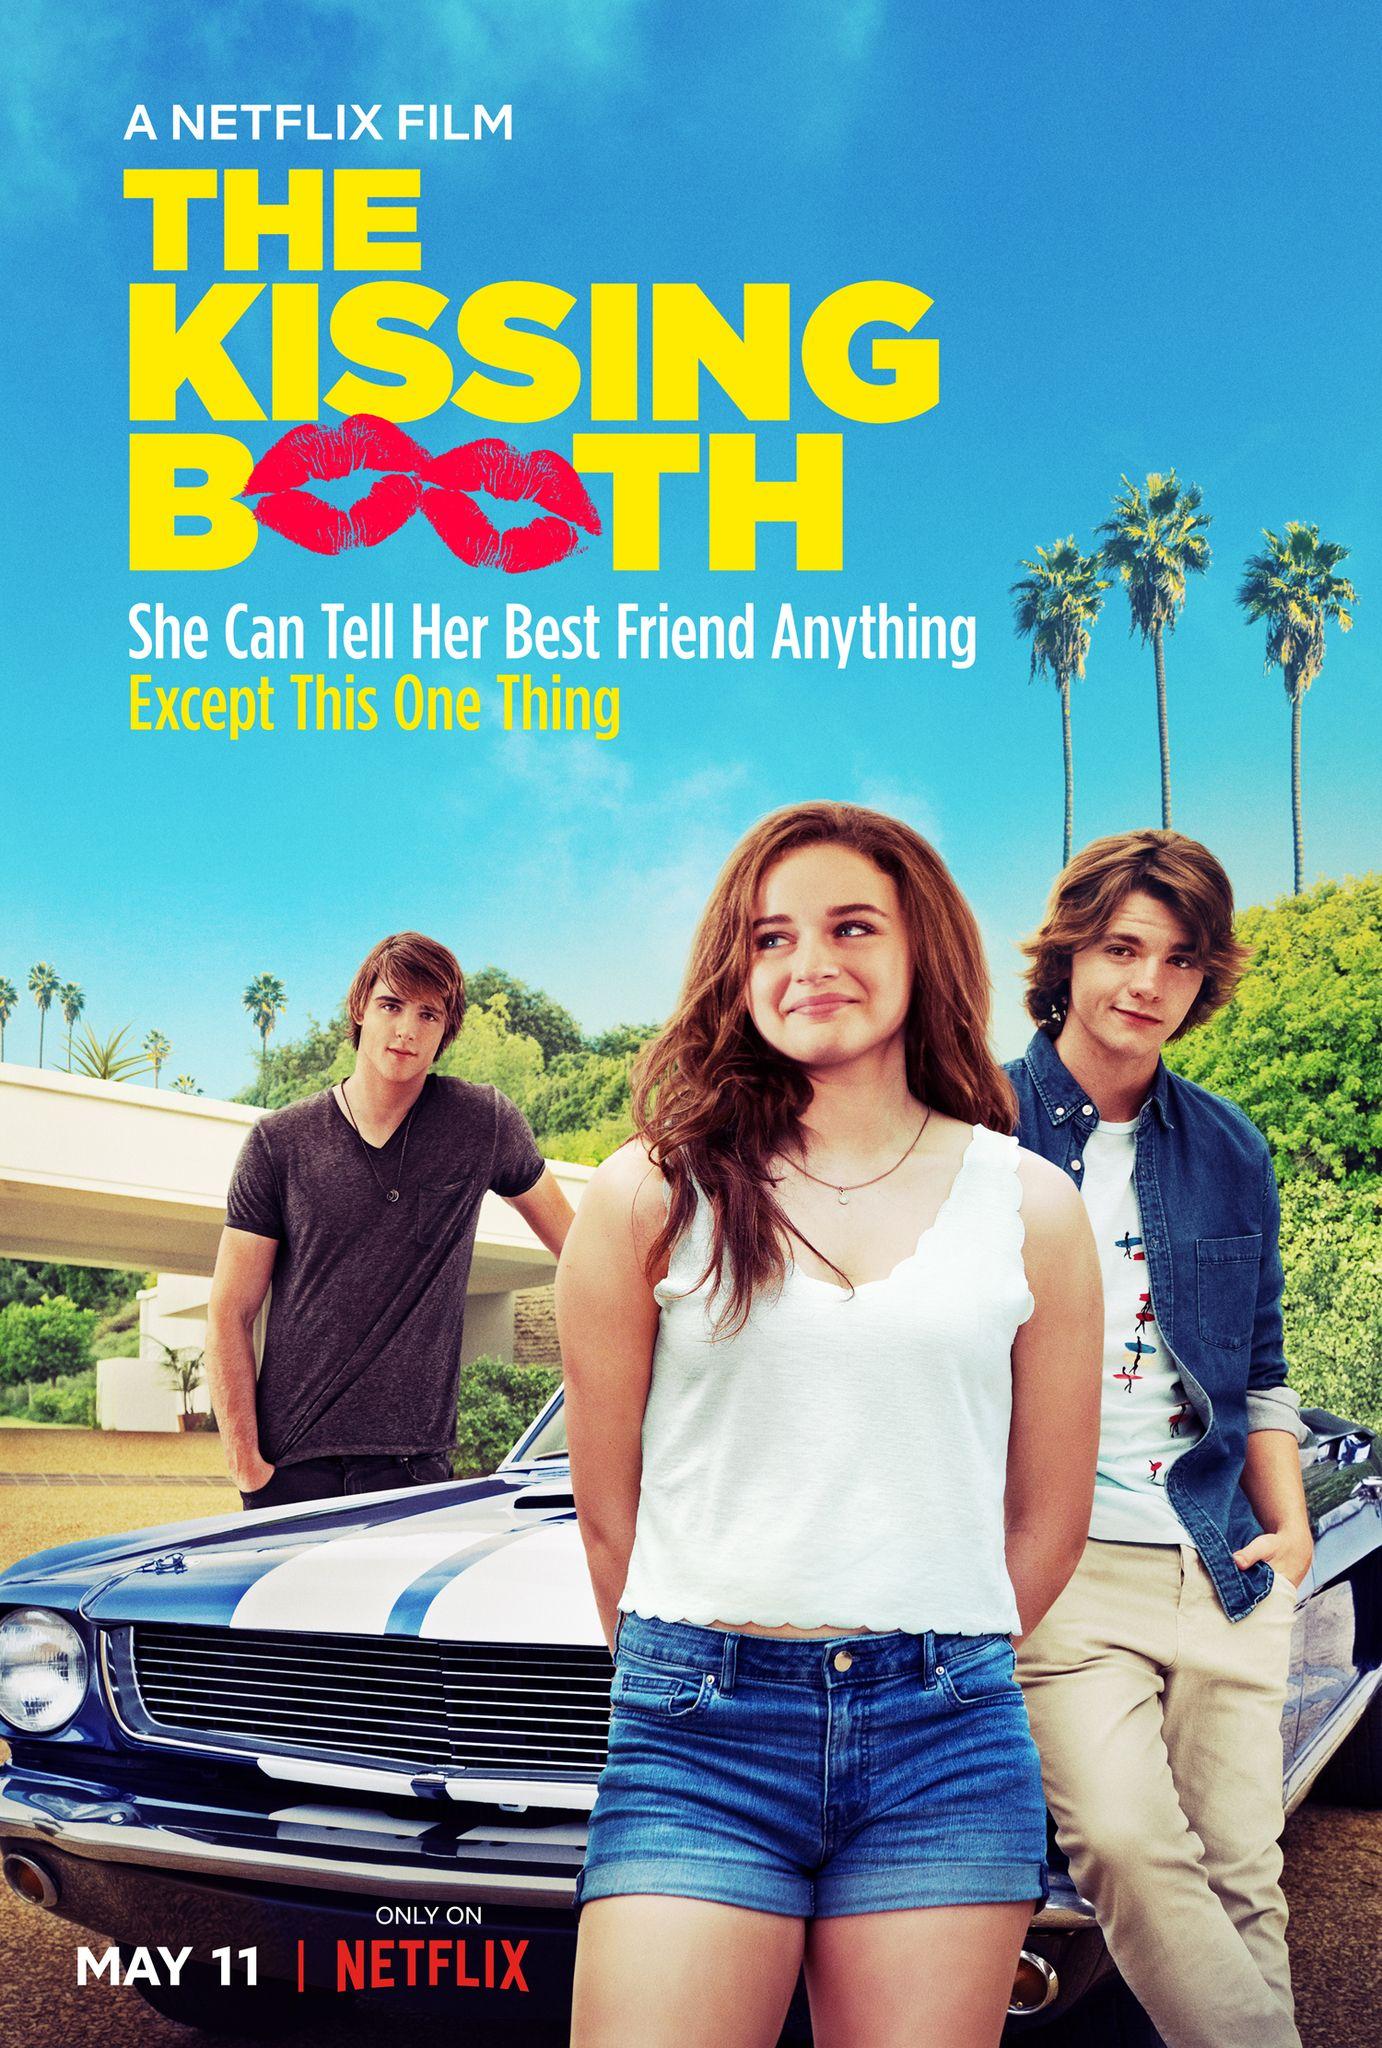 Film Romantis Barat Terbaik Netflix : romantis, barat, terbaik, netflix, Movies, Netflix, Films, Stream